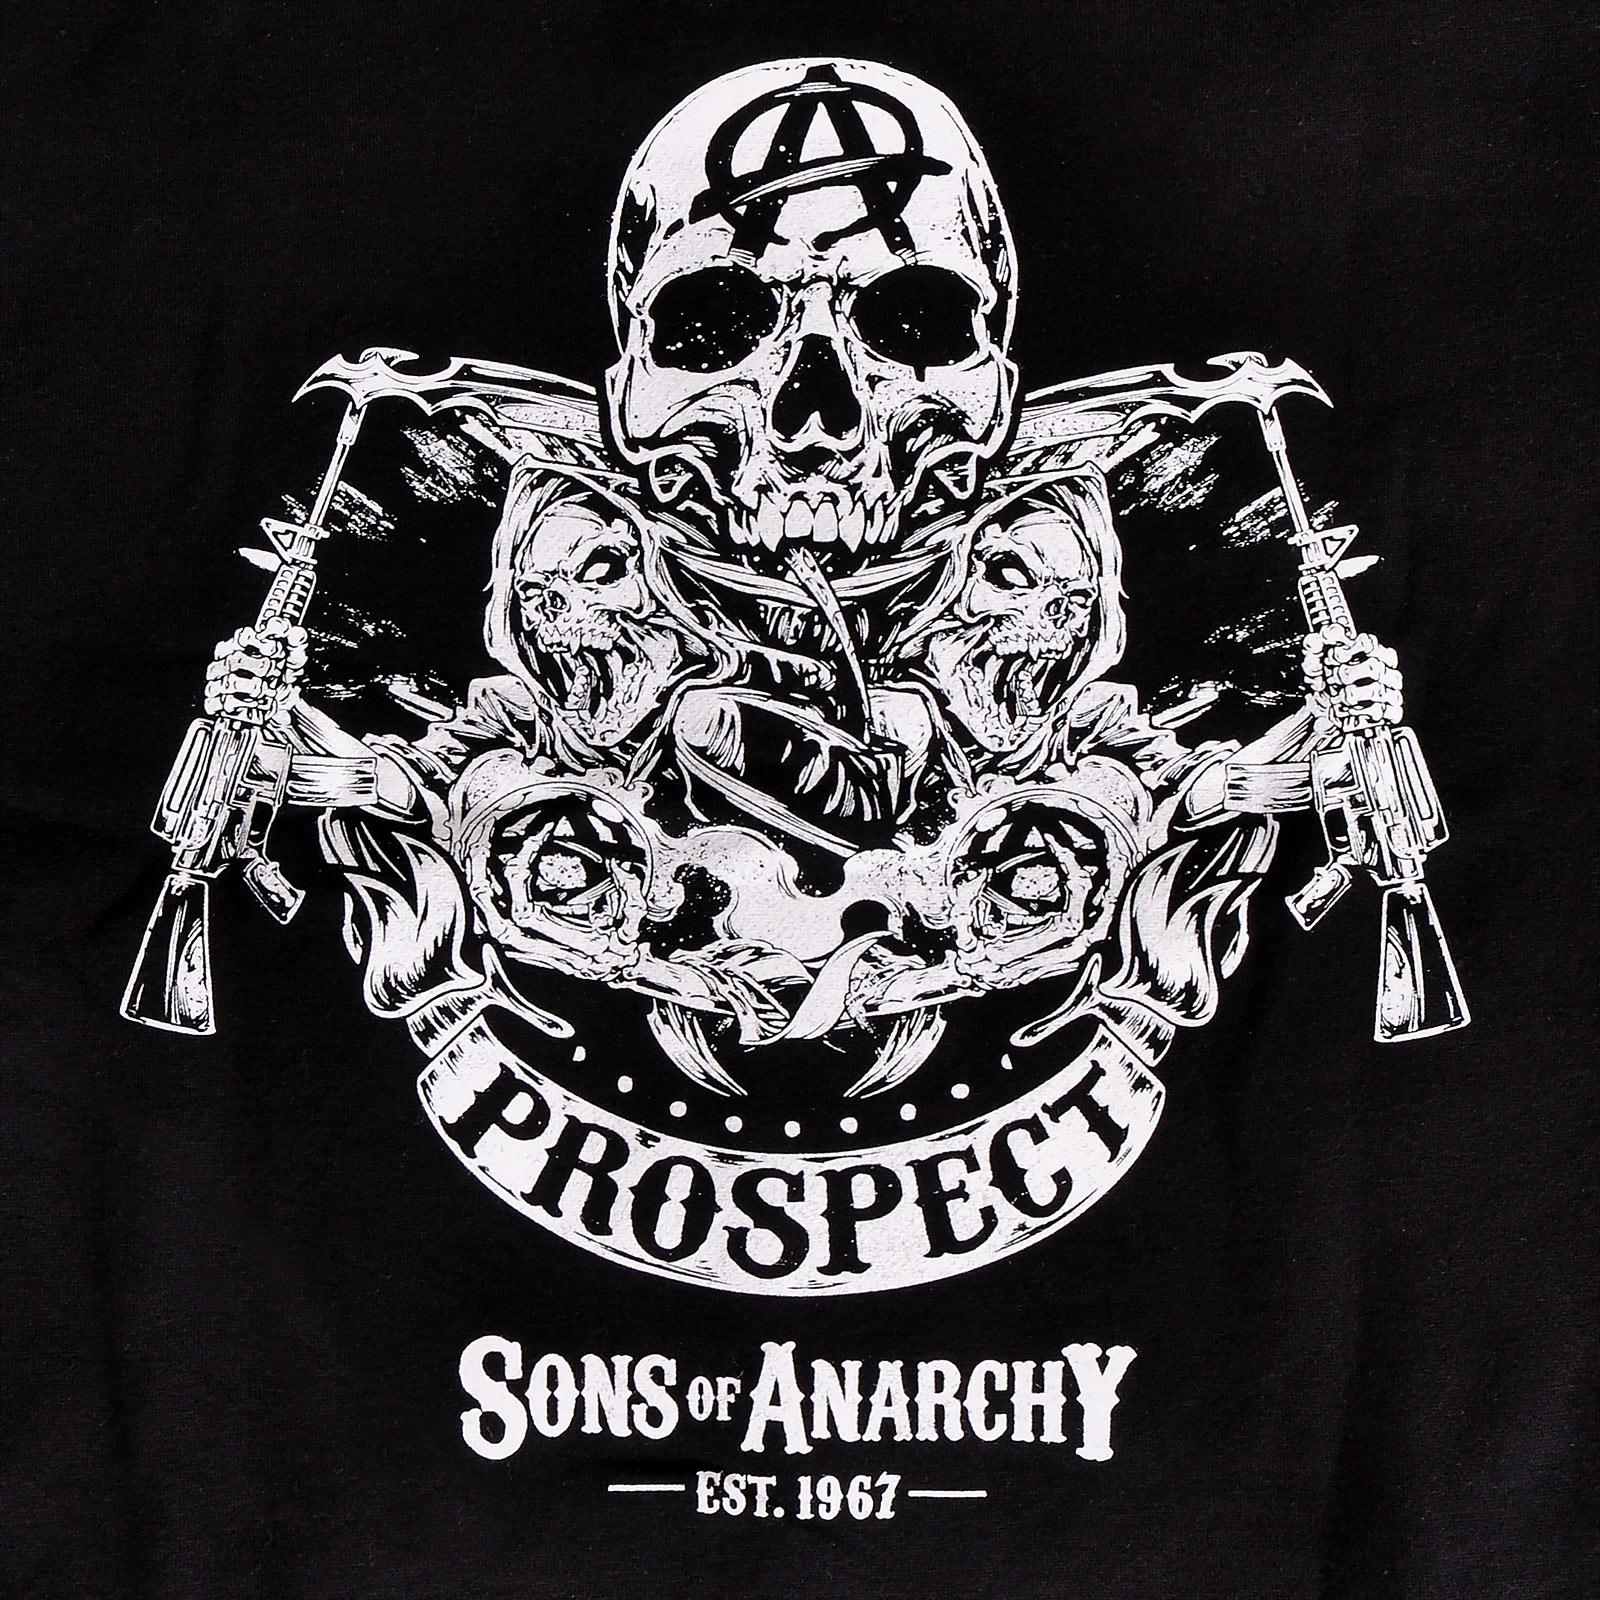 Sons of Anarchy - Reaper & Prospect College Jacke schwarz-weiß